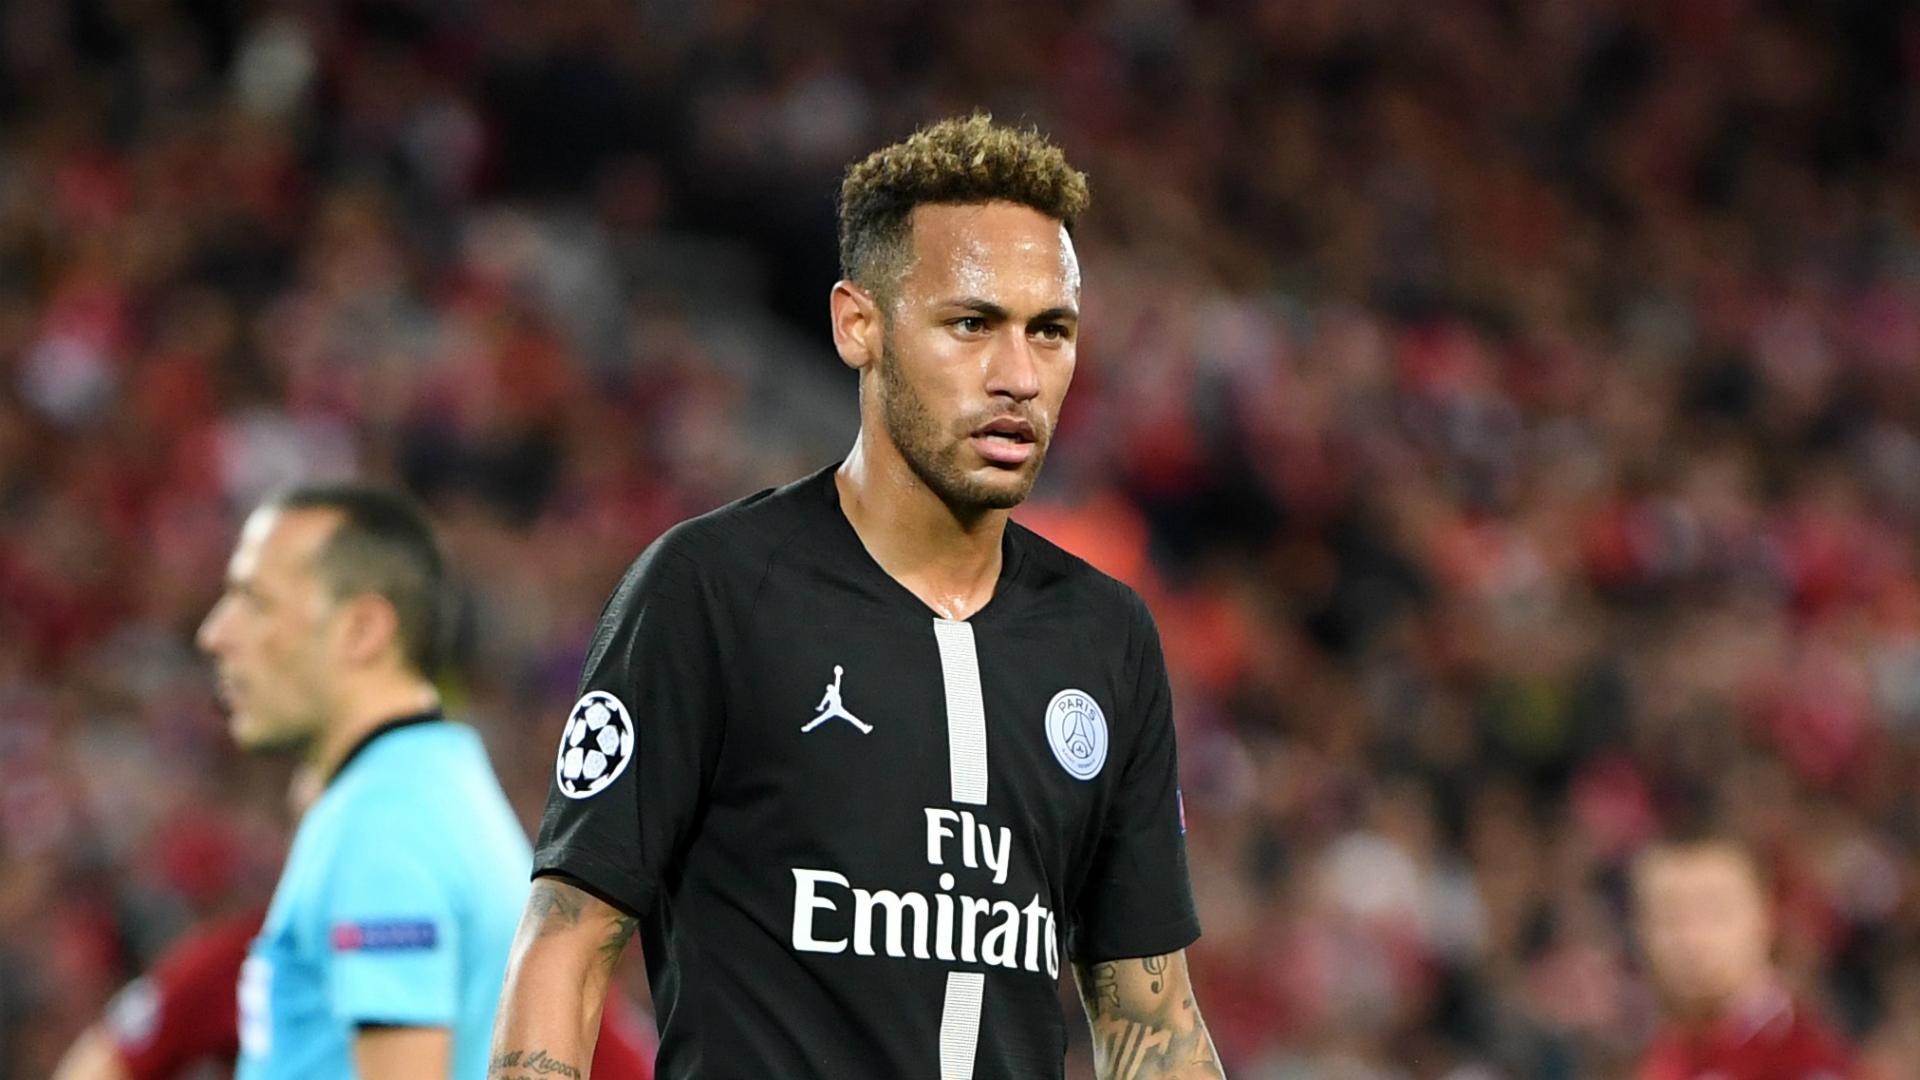 Neymar world-class but not a defender - Klopp says Liverpool targeted PSG star